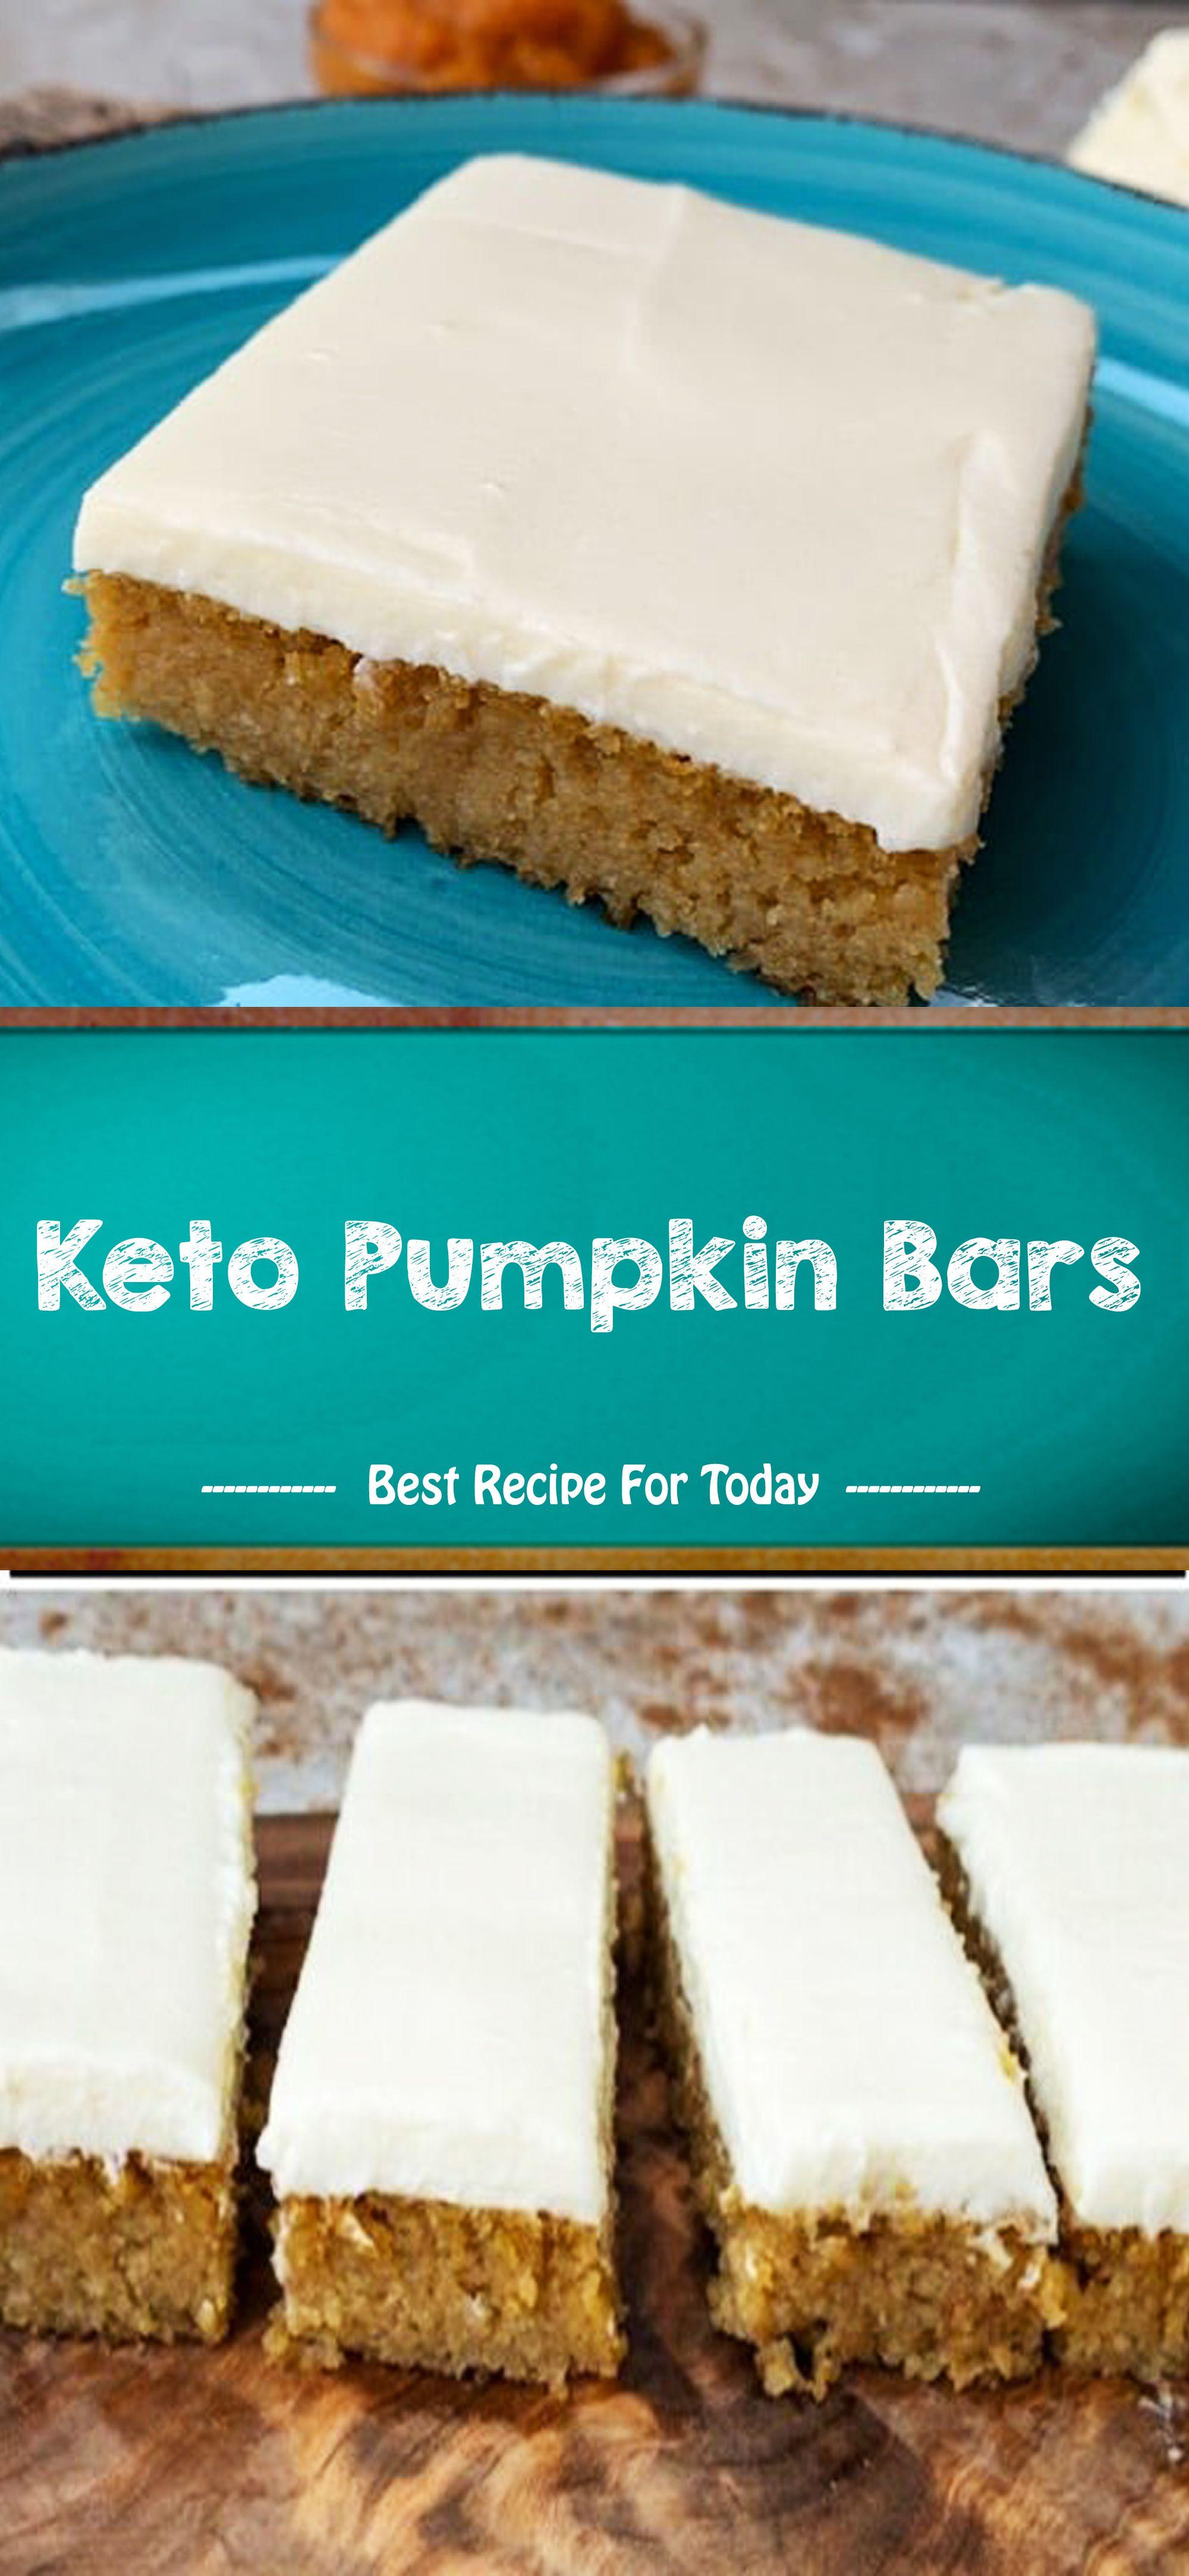 Keto Pumpkin Bars